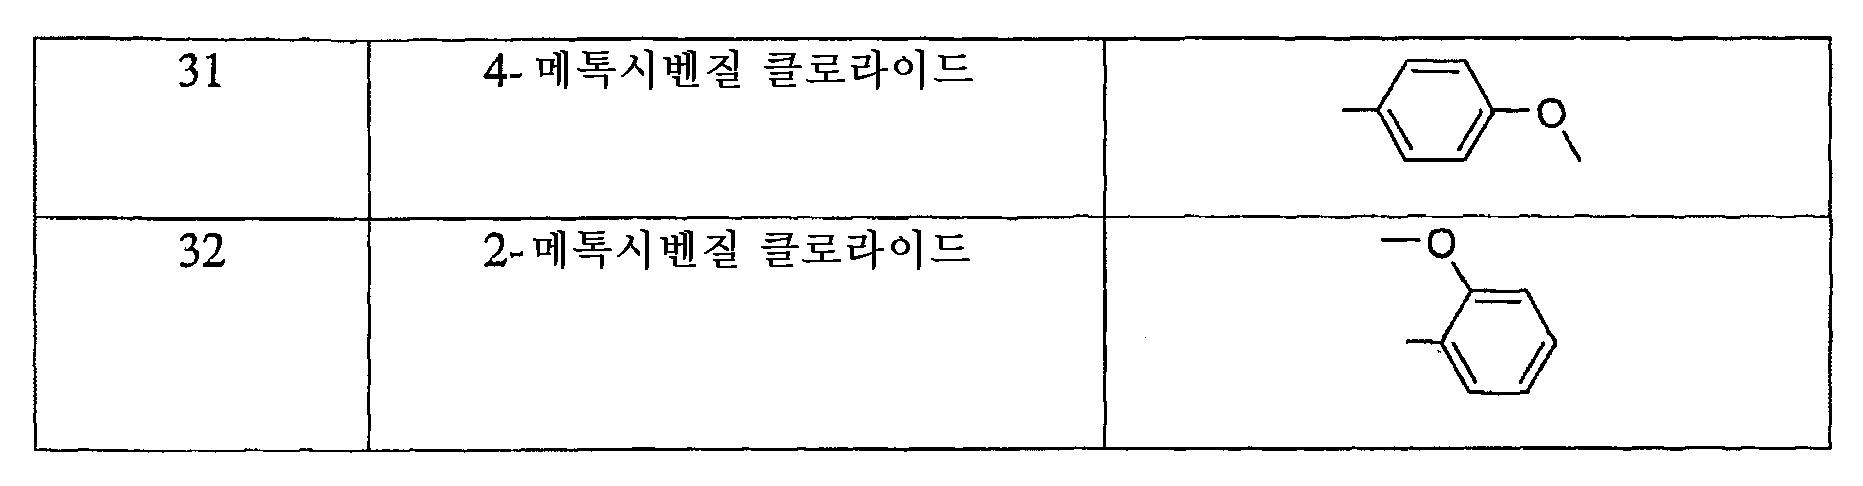 Figure 112006013759285-pct00140